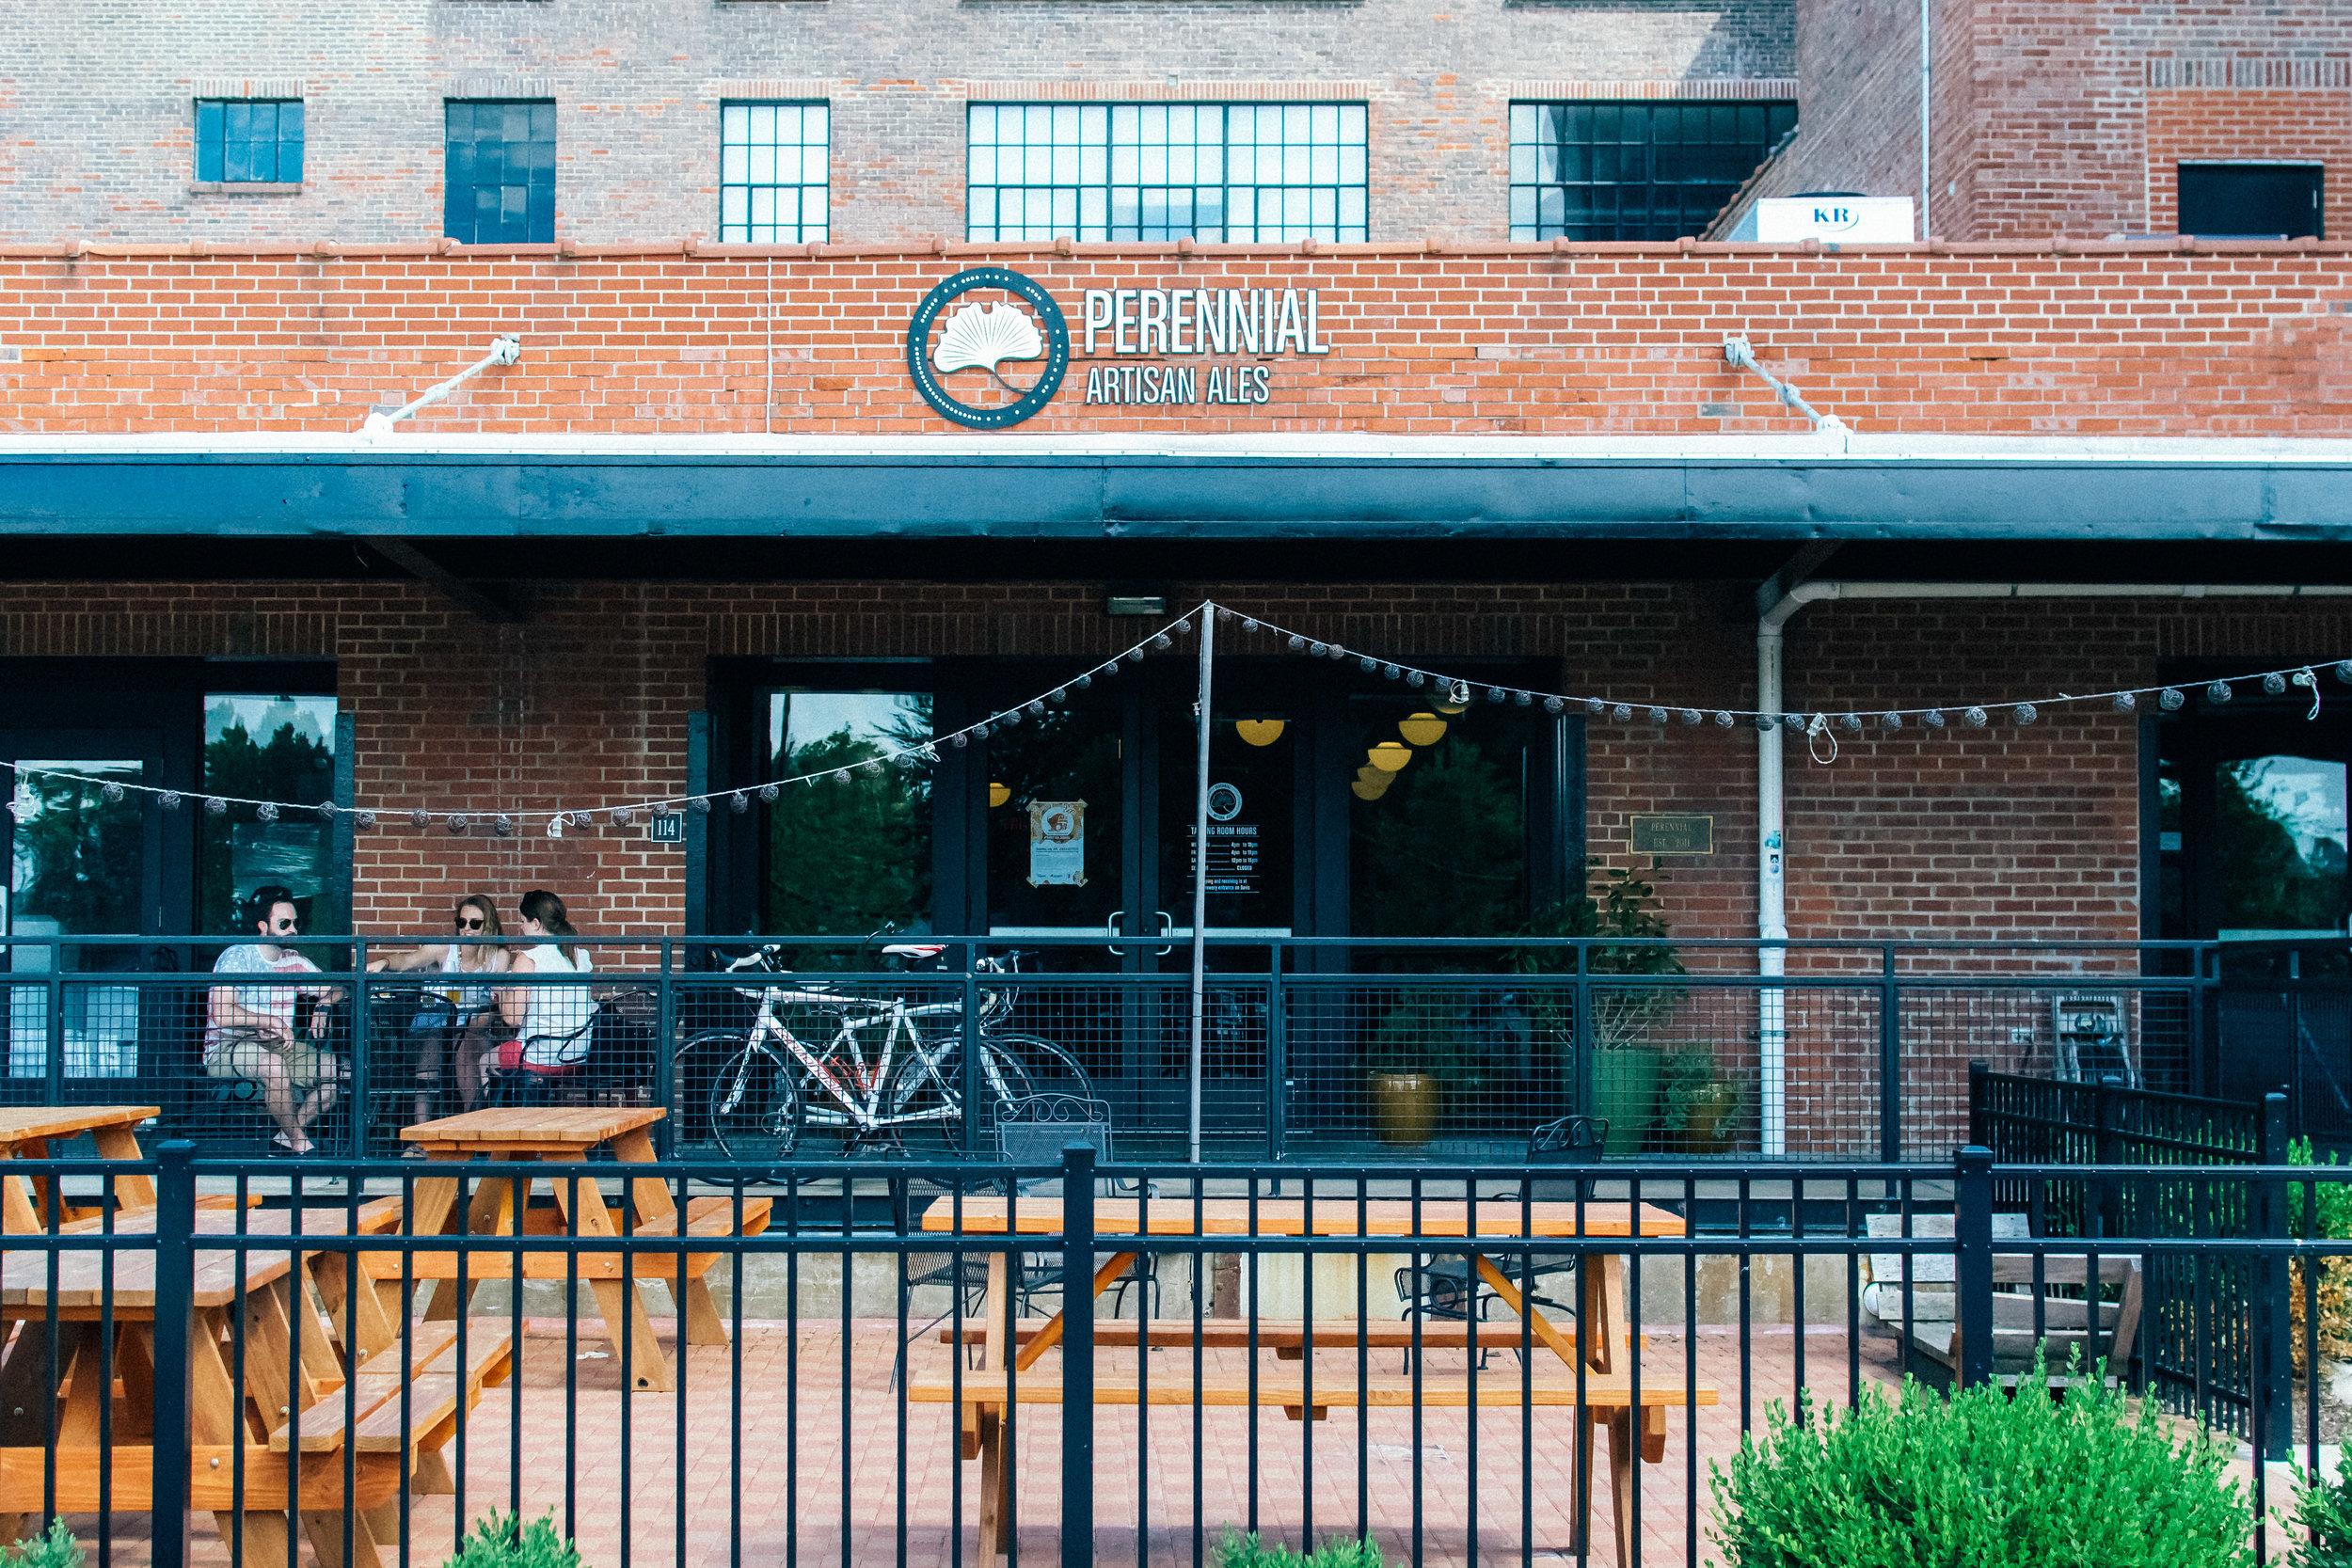 Perennial-Artisan-Ales-St-Louis-Missouri-Beer-Matt-Sampson-Photography-Front.jpg